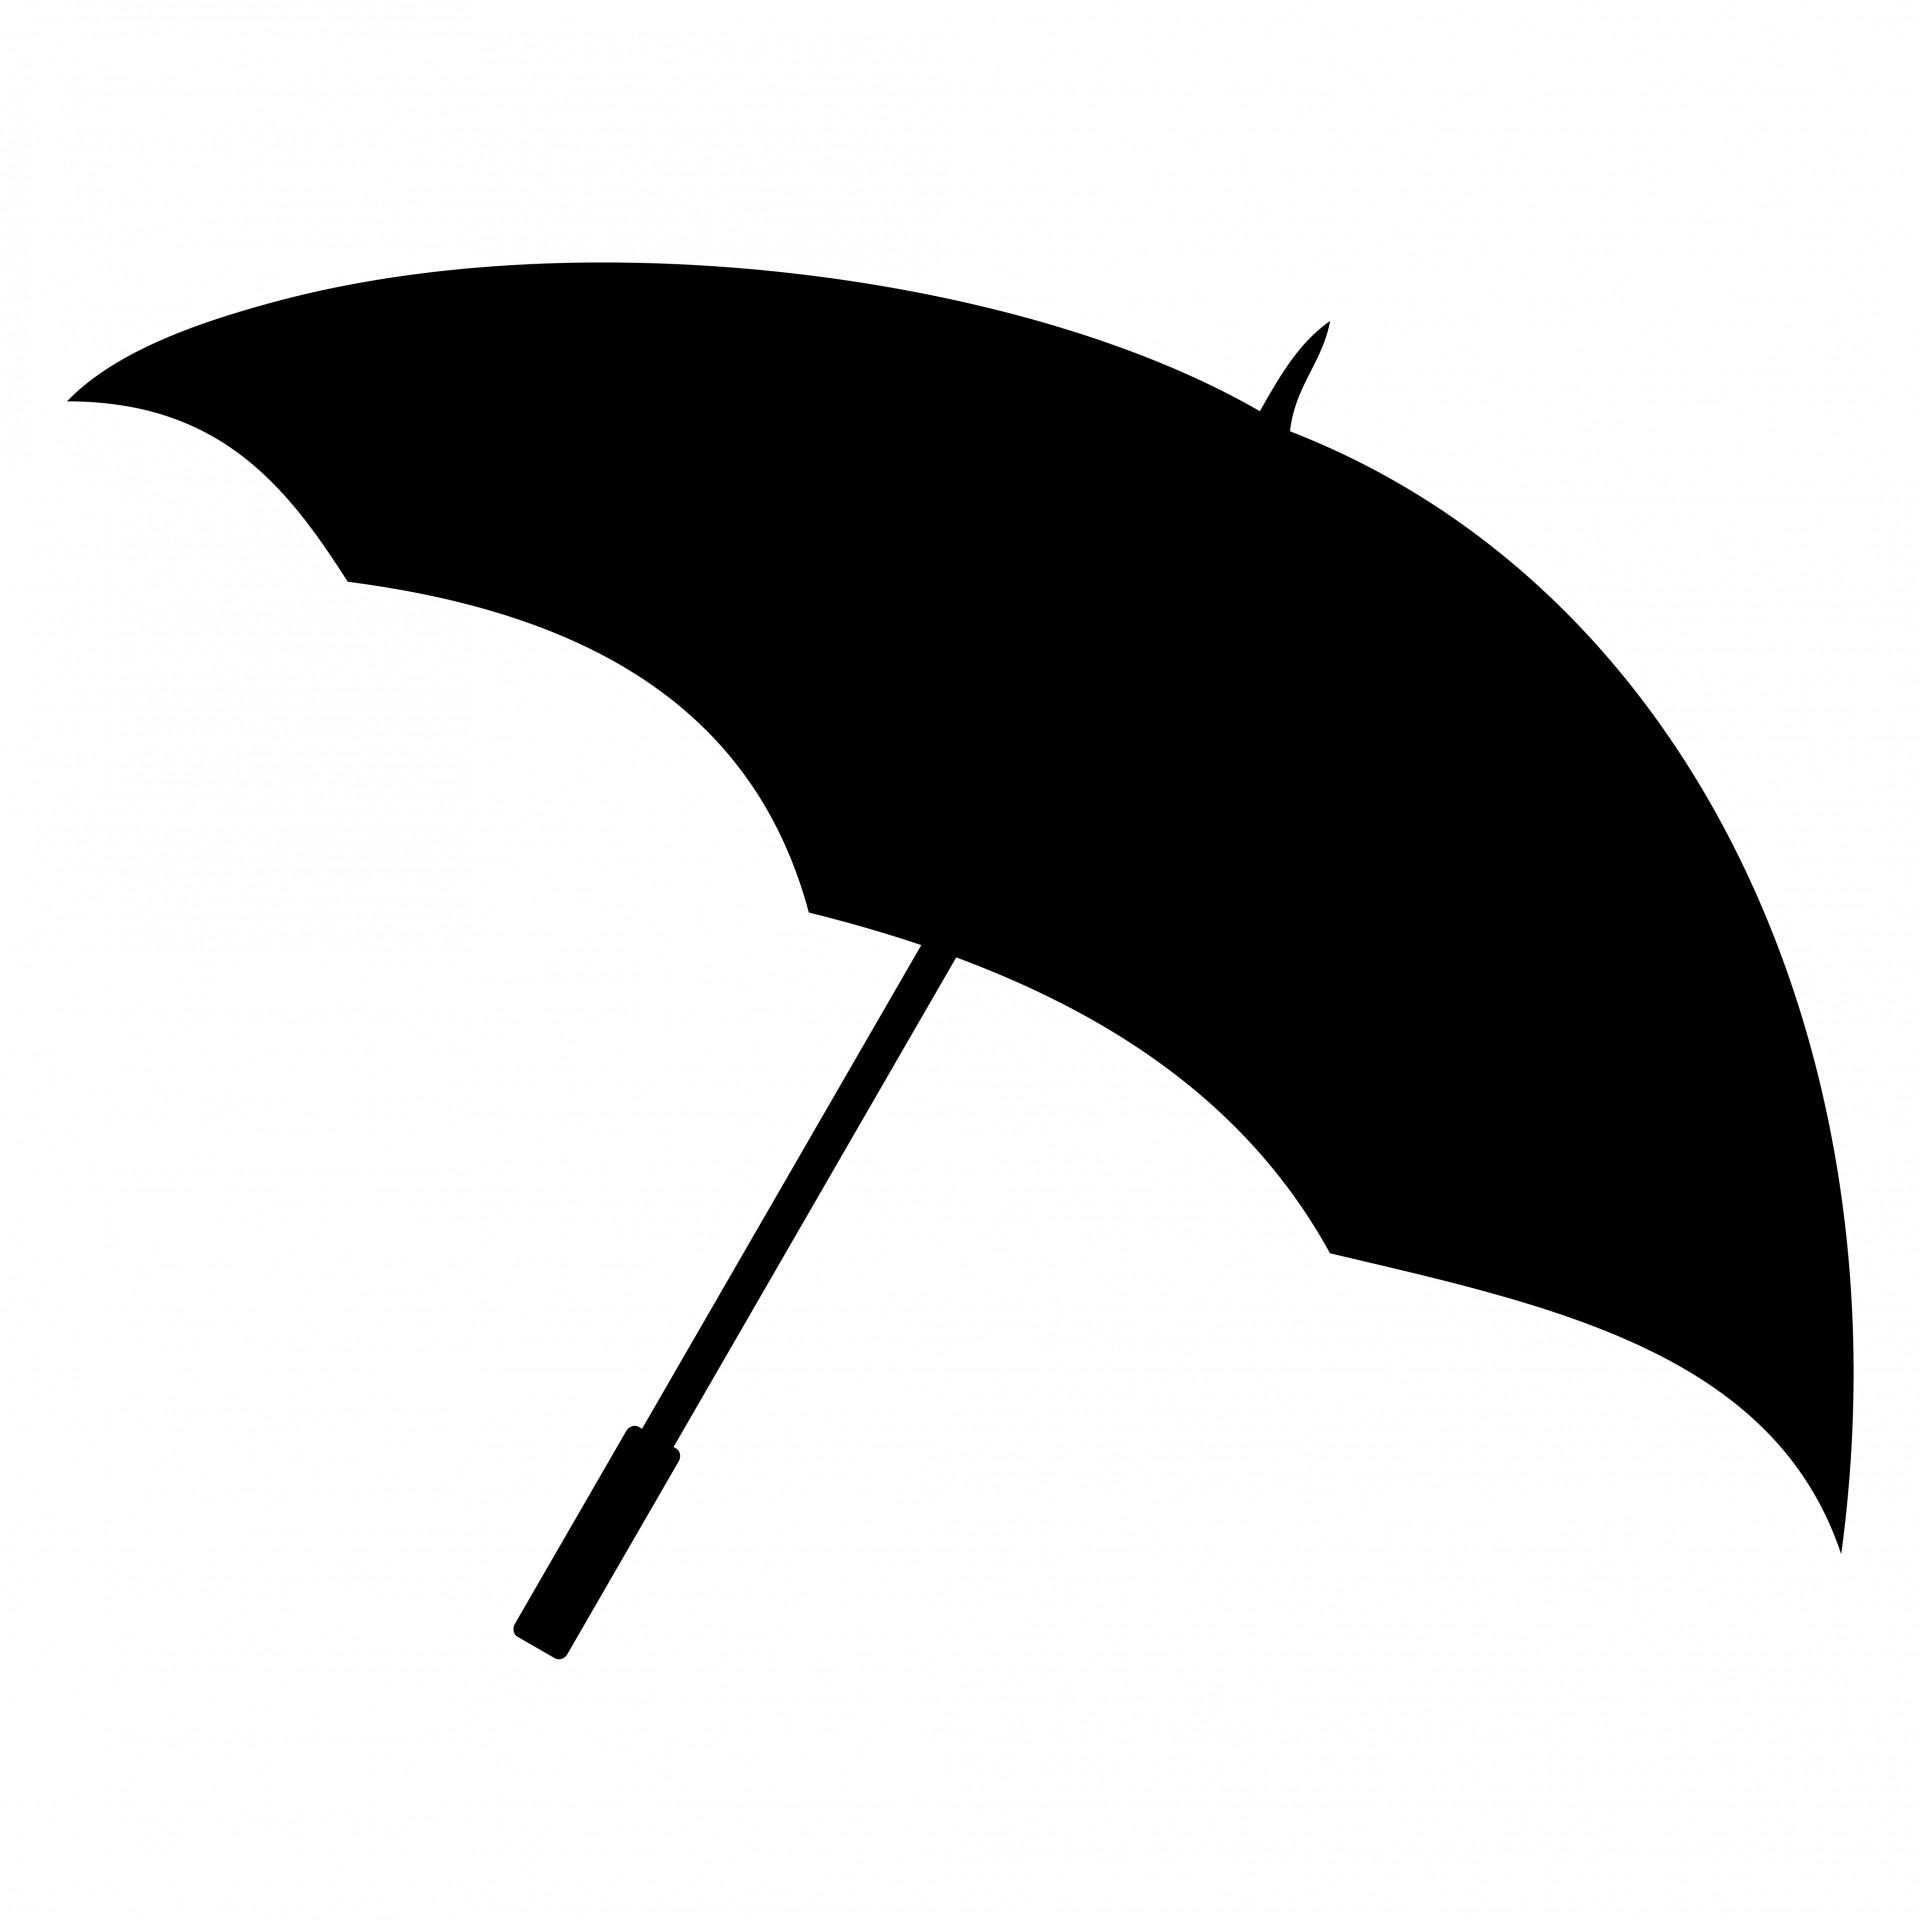 Umbrella Clipart Free Stock .-Umbrella clipart free stock .-14